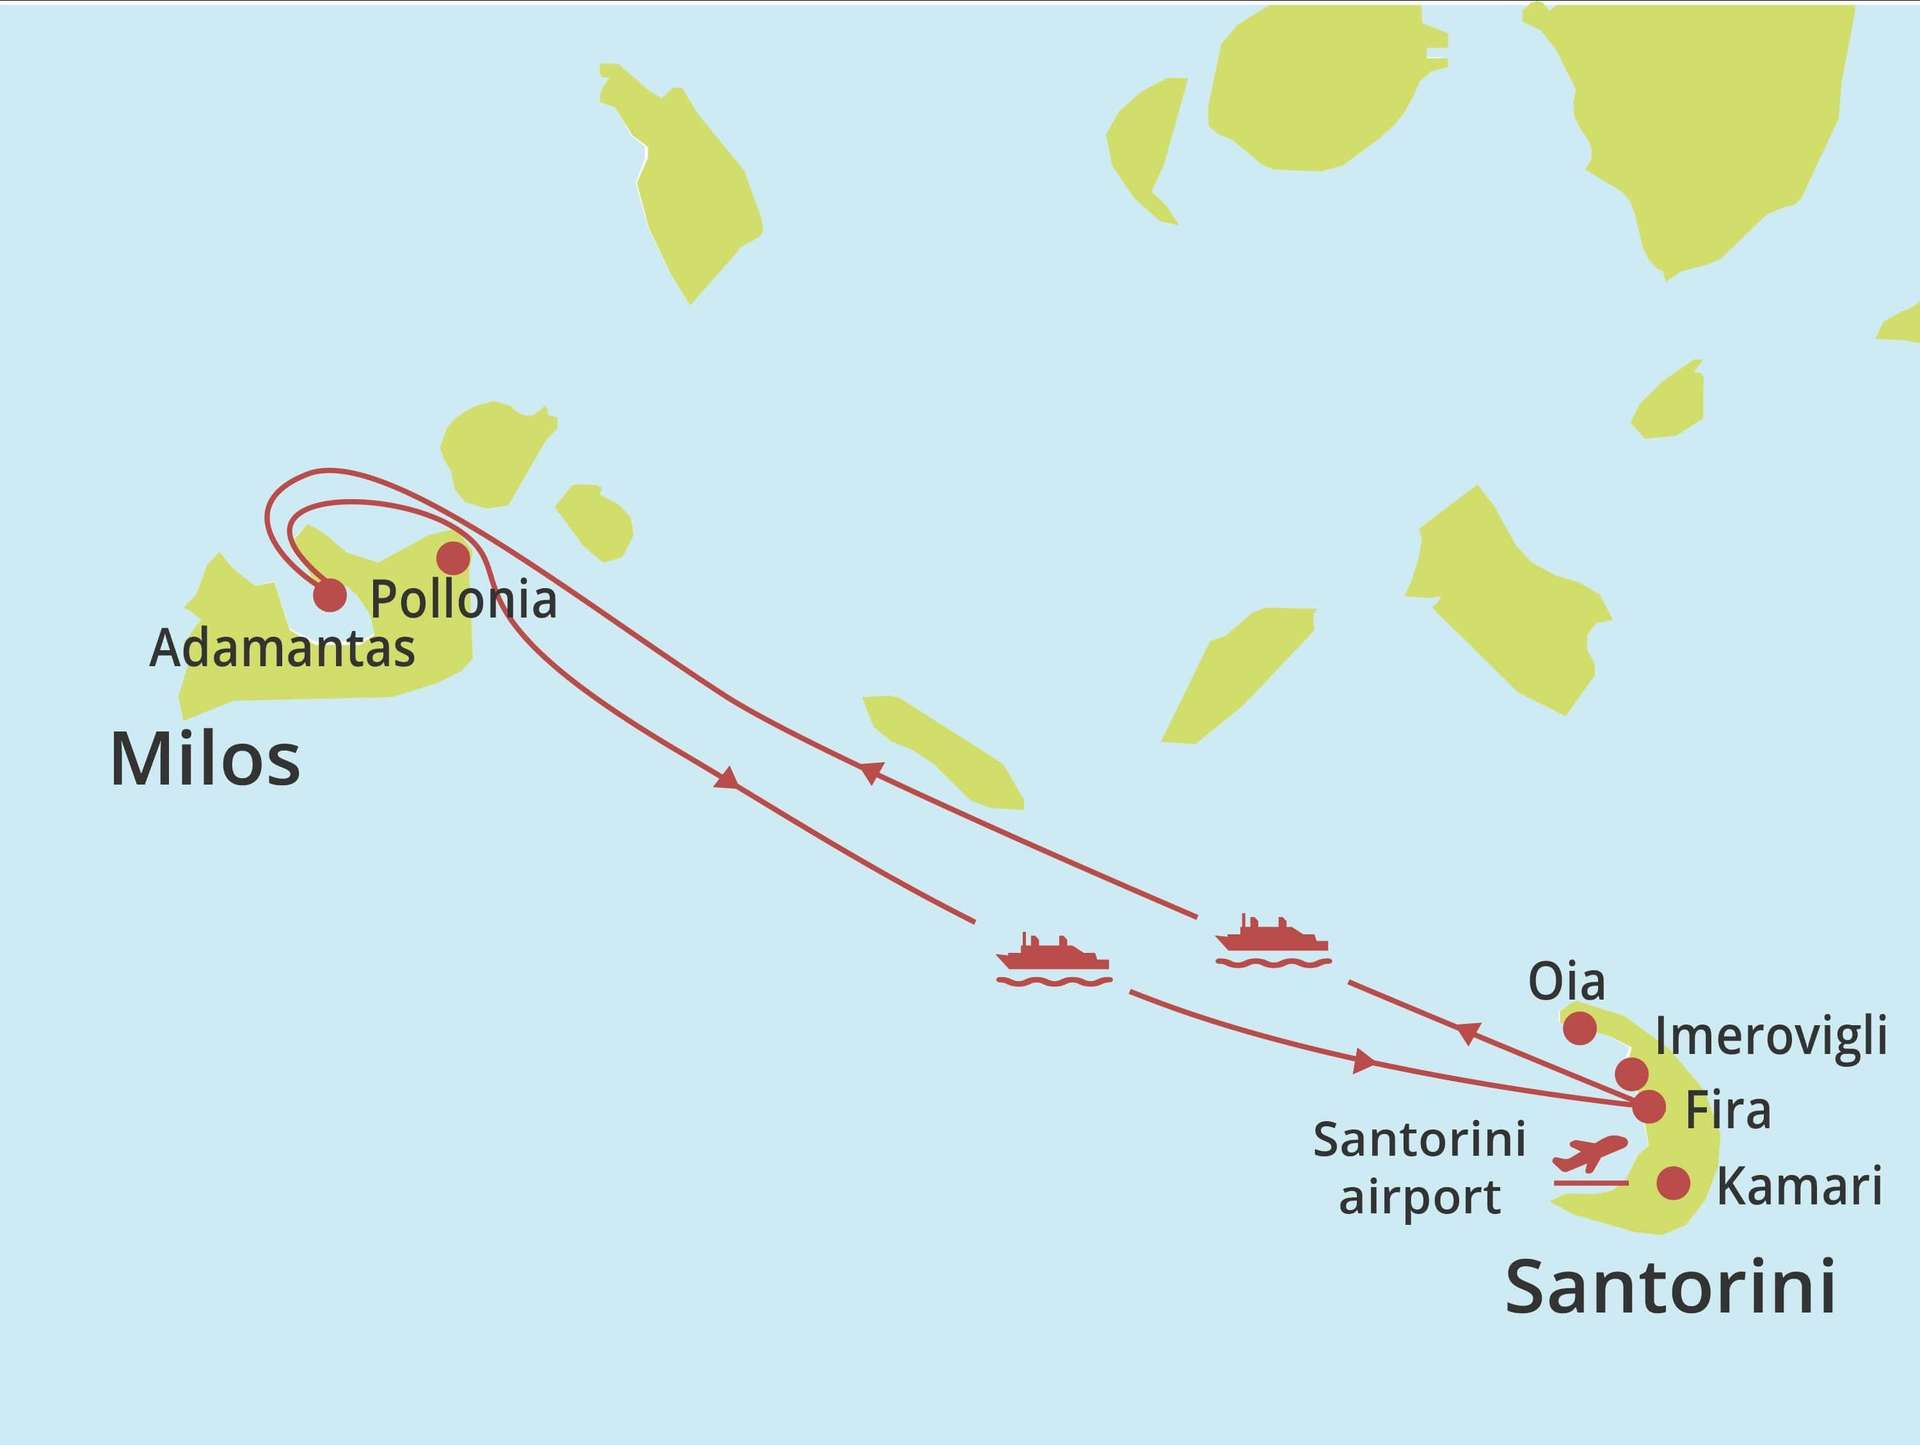 Eilandhoppen Milos - Santorini